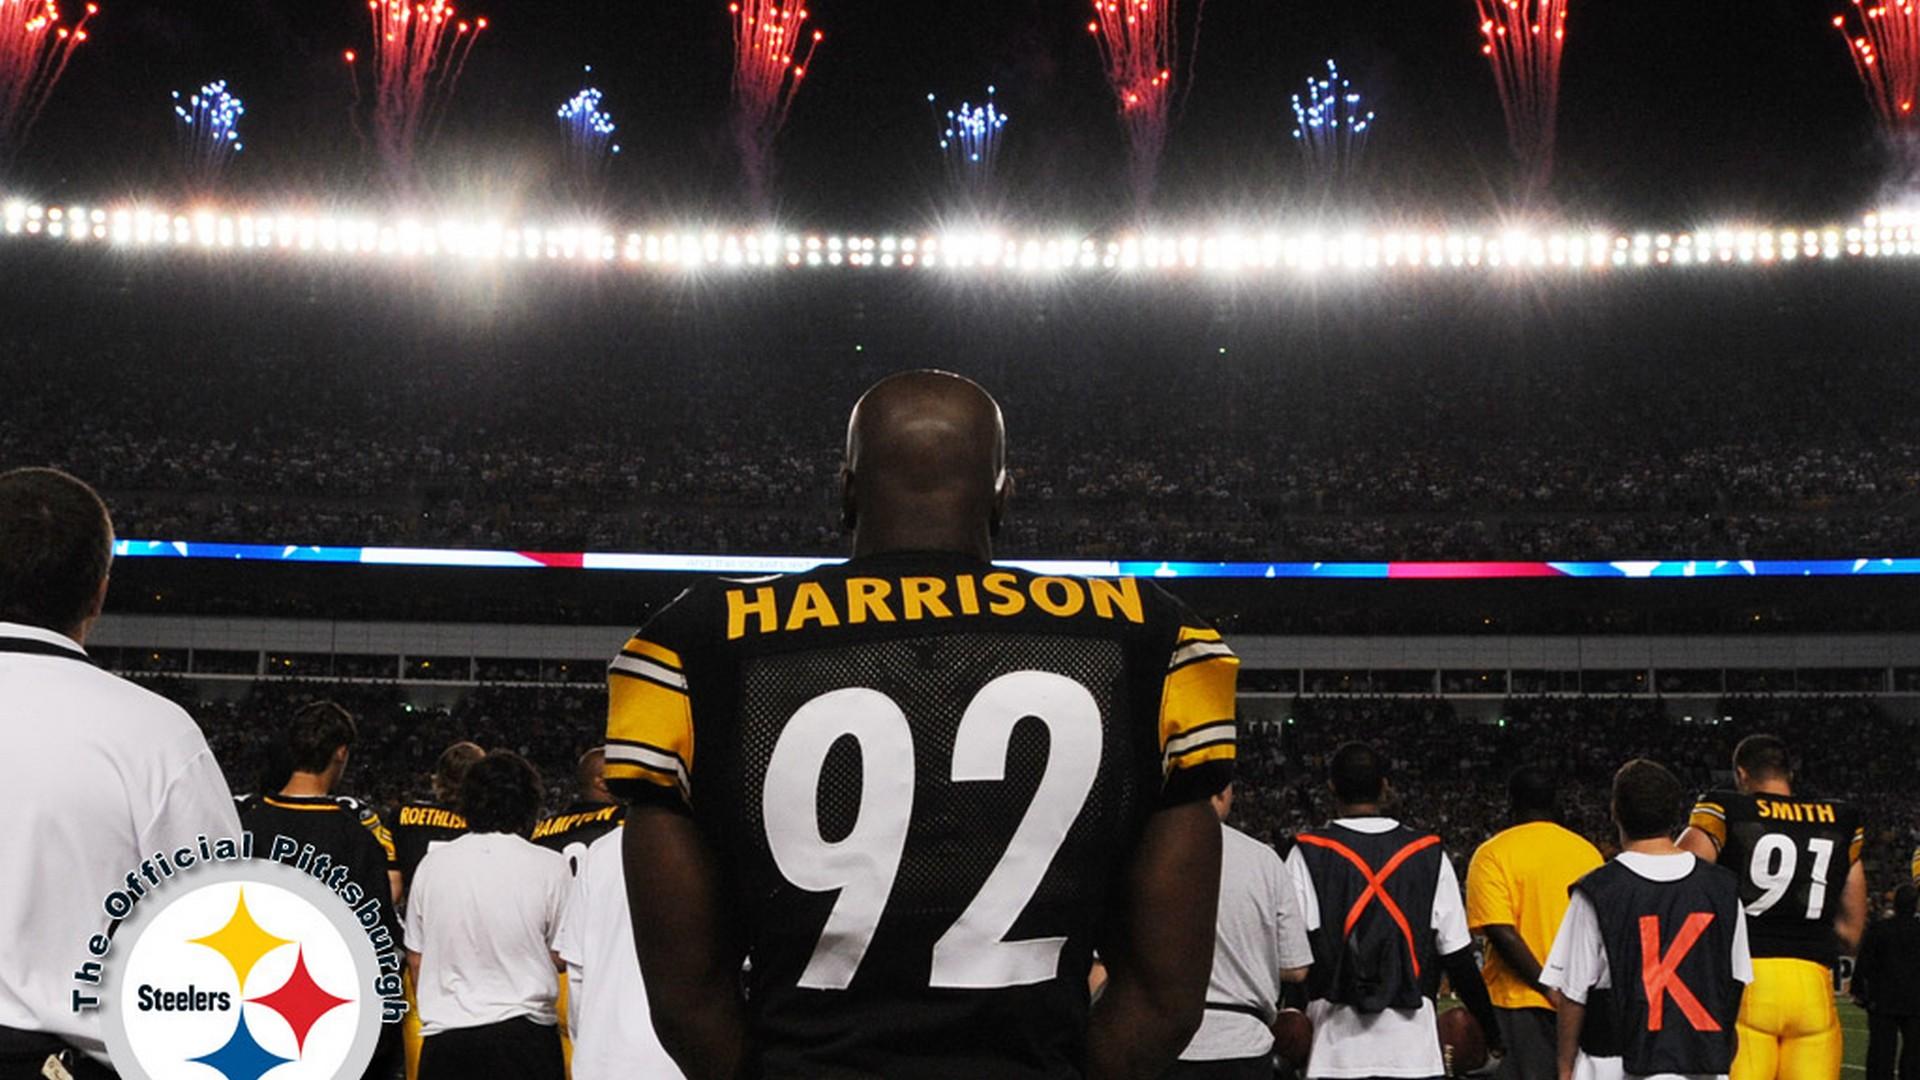 Steelers Iphone Wallpaper Nfl Steelers Hd Wallpapers 2019 Nfl Football Wallpapers